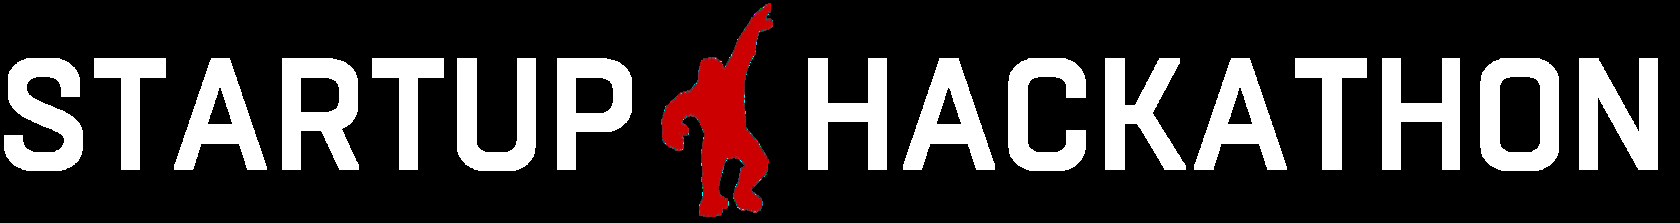 STARTUP-HACKATHON